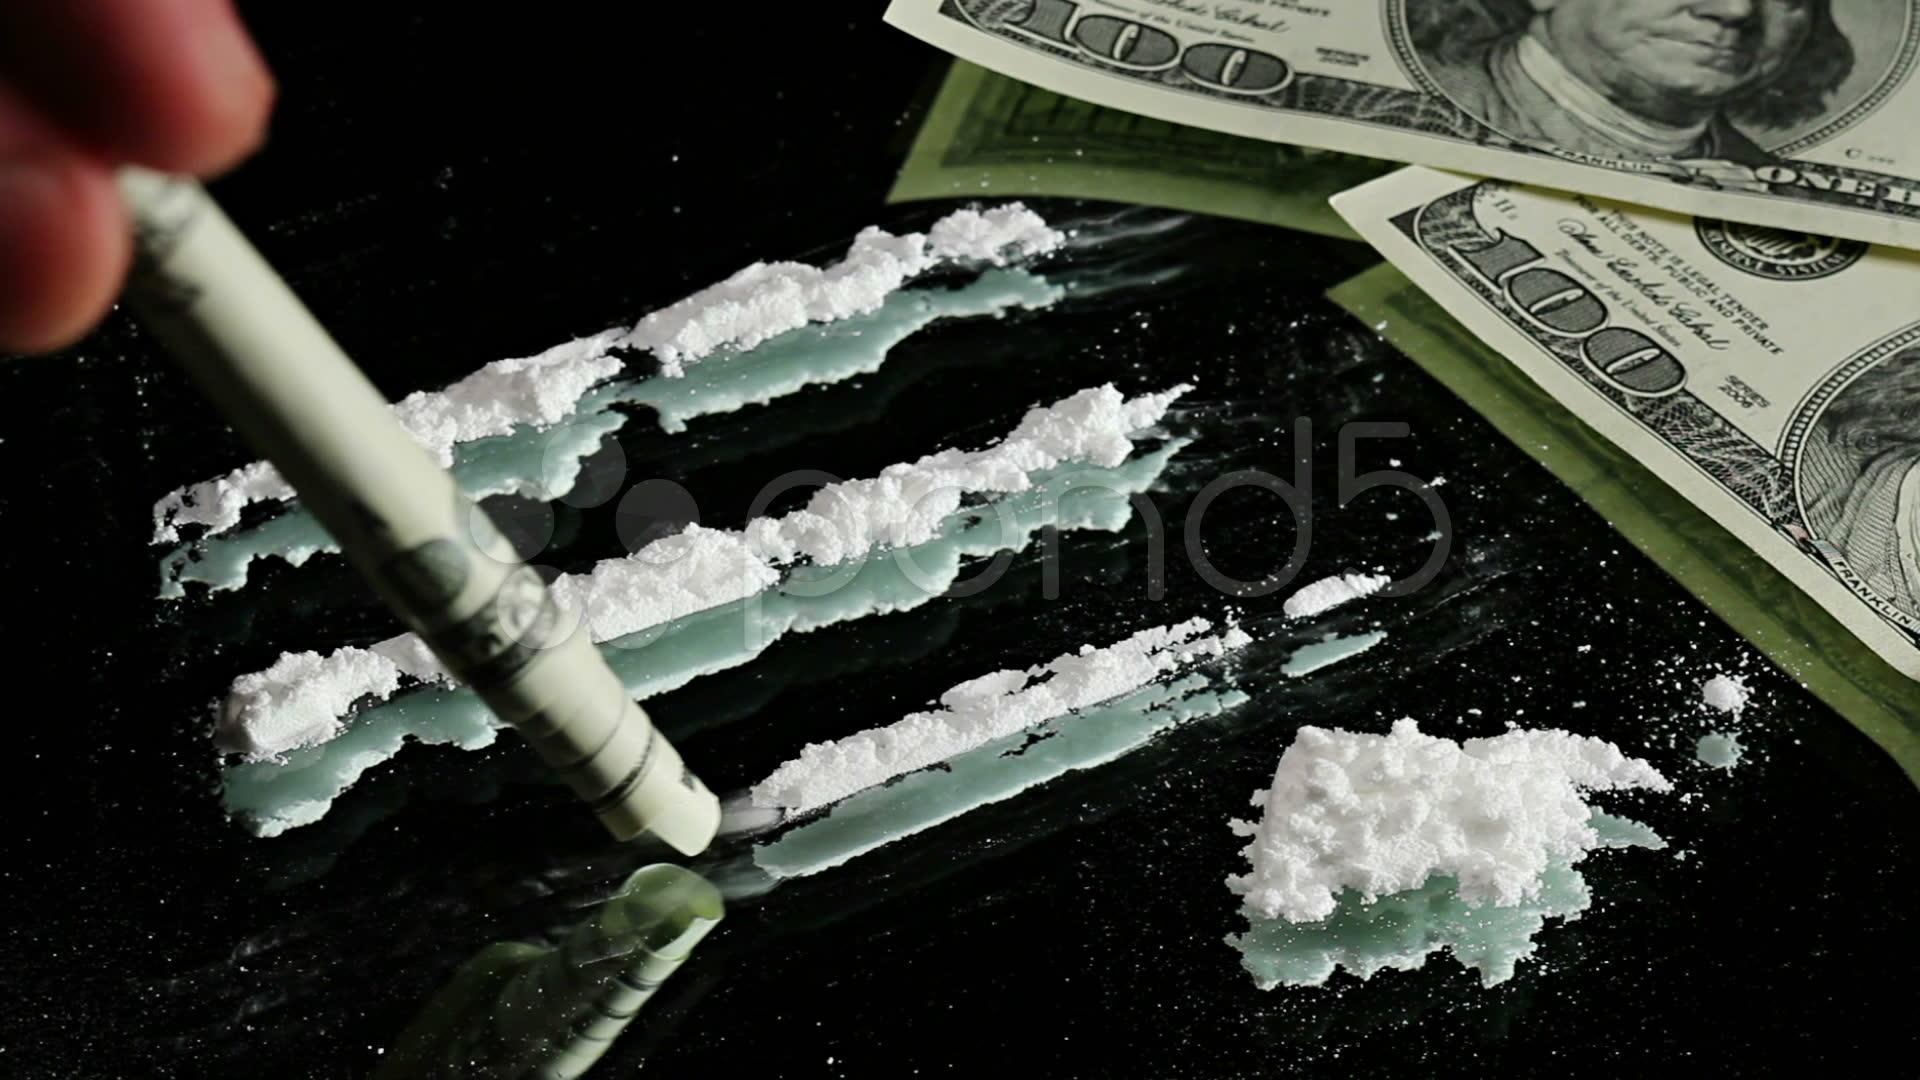 Cocaine Wallpaper HD 1920x1080